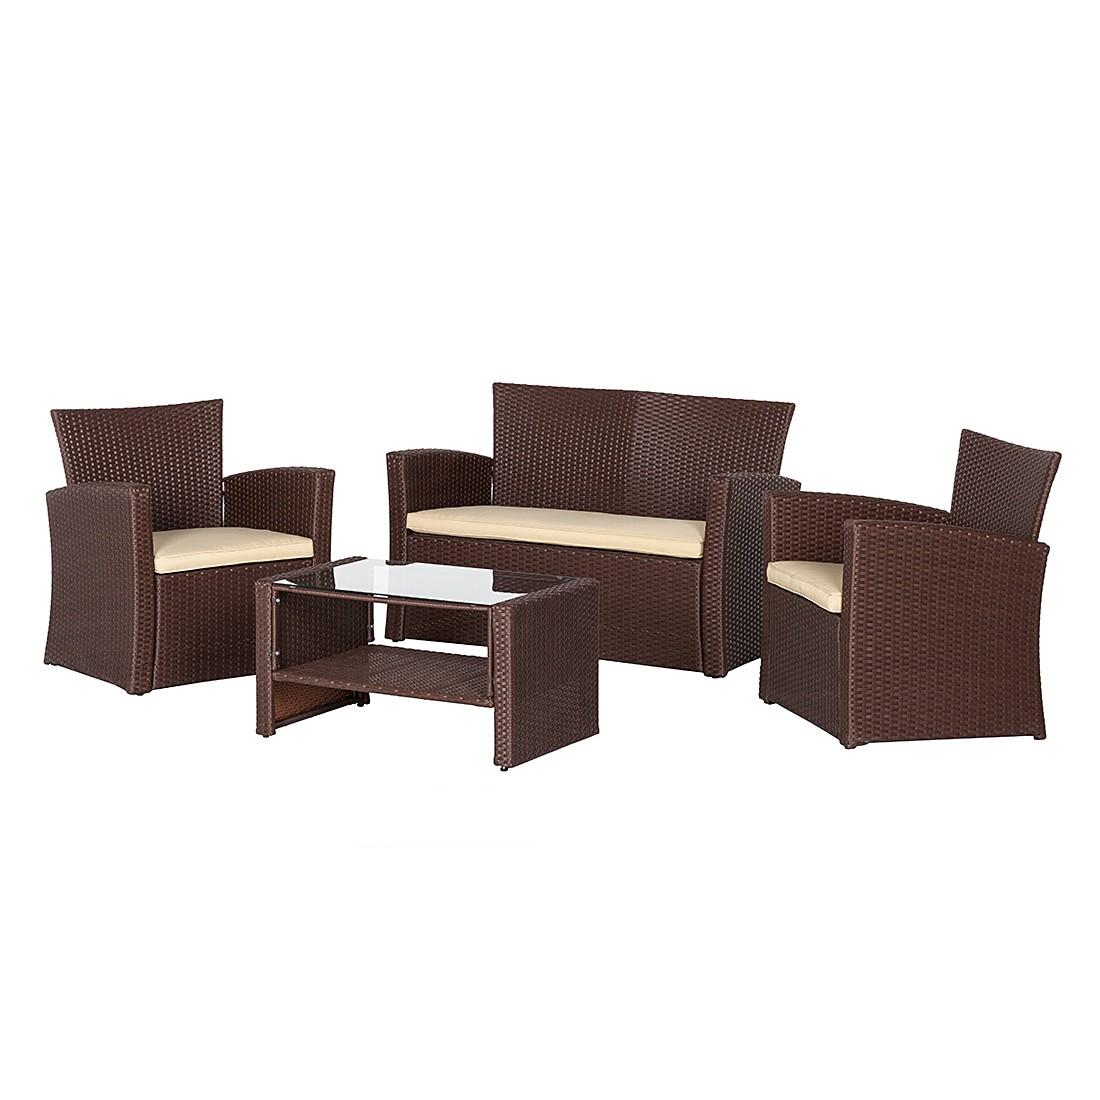 sitzgruppe brindisi 4 teilig polyrattan braun kings. Black Bedroom Furniture Sets. Home Design Ideas